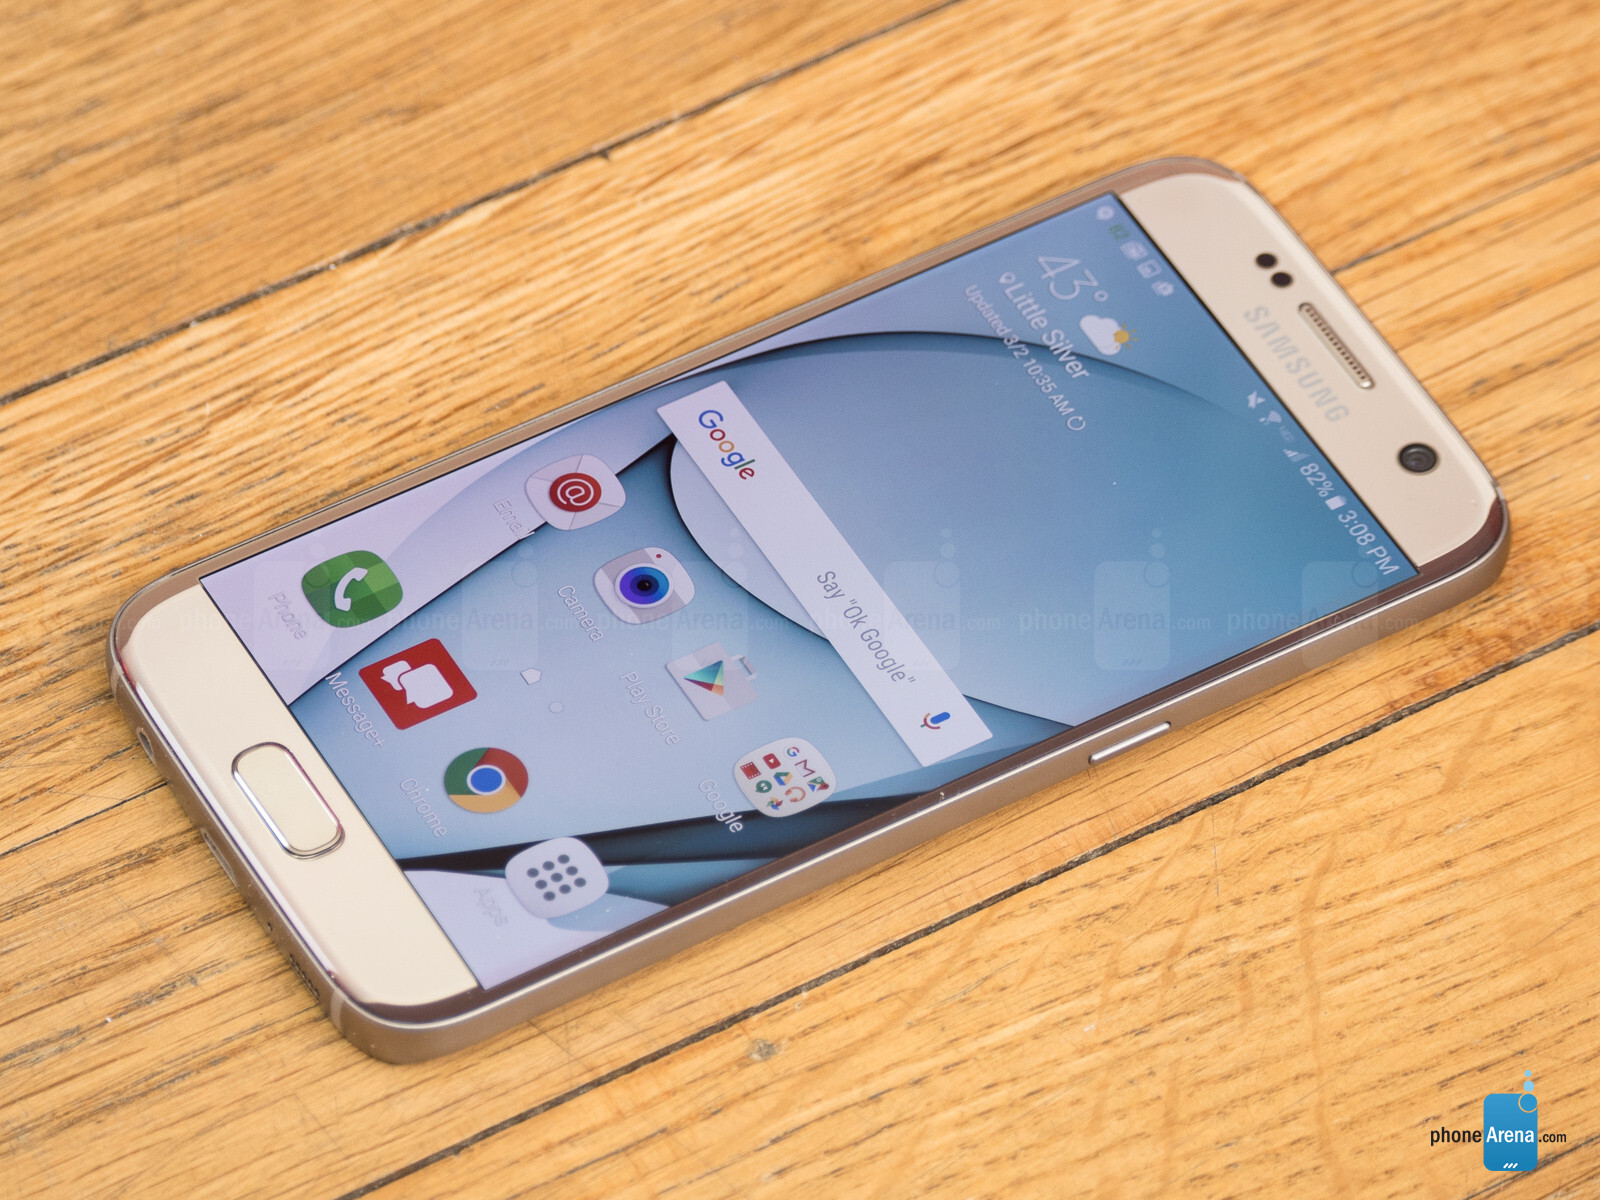 Samsung Galaxy S7 Reviews